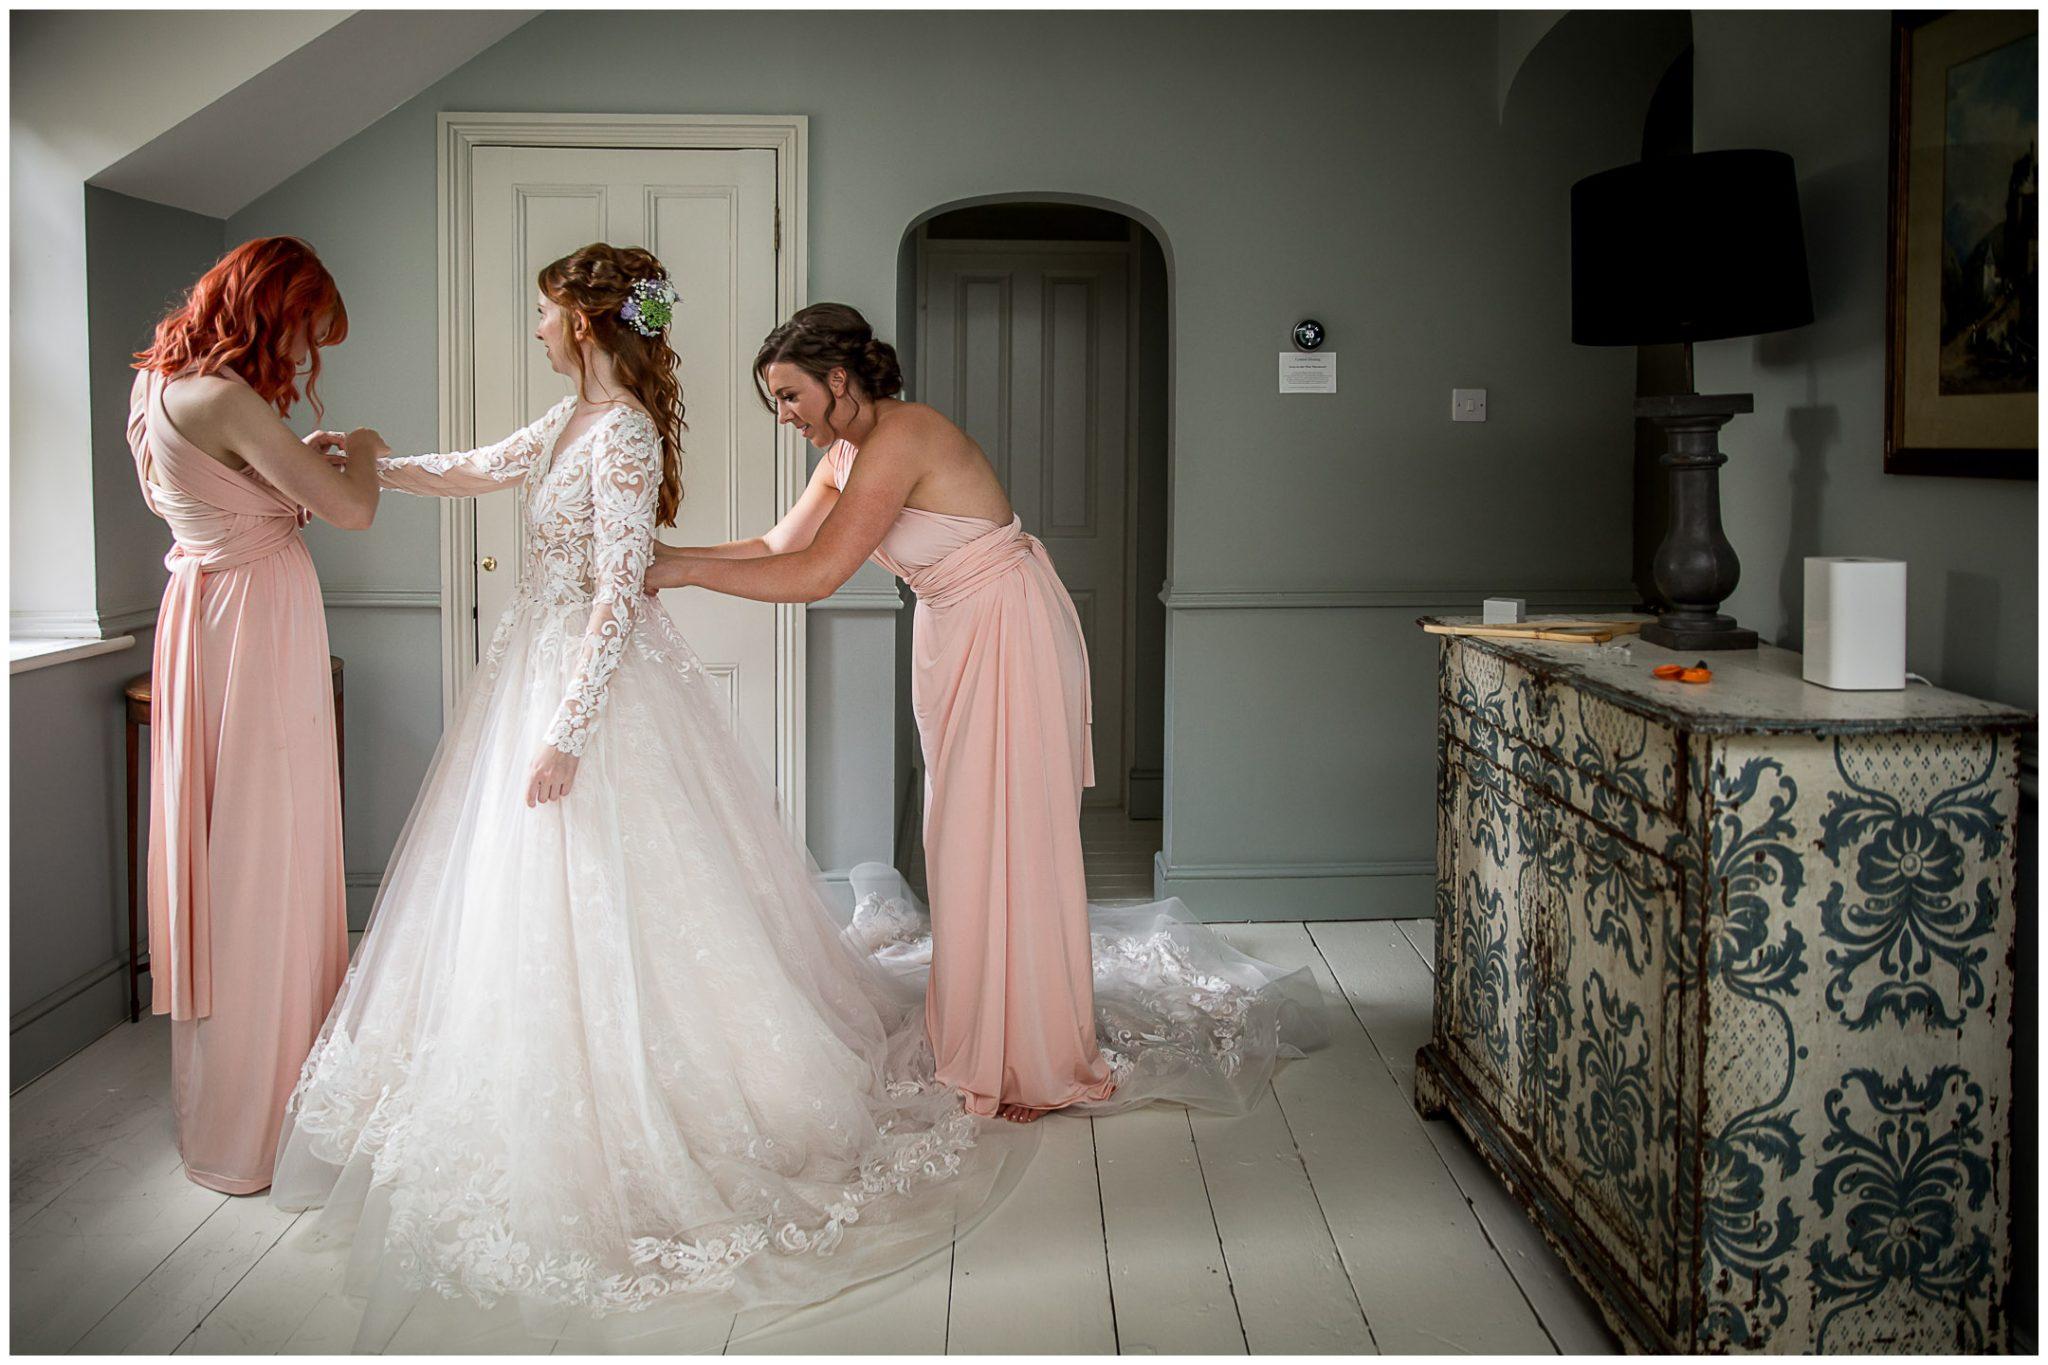 Bridesmaids help the bride get into the wedding dress